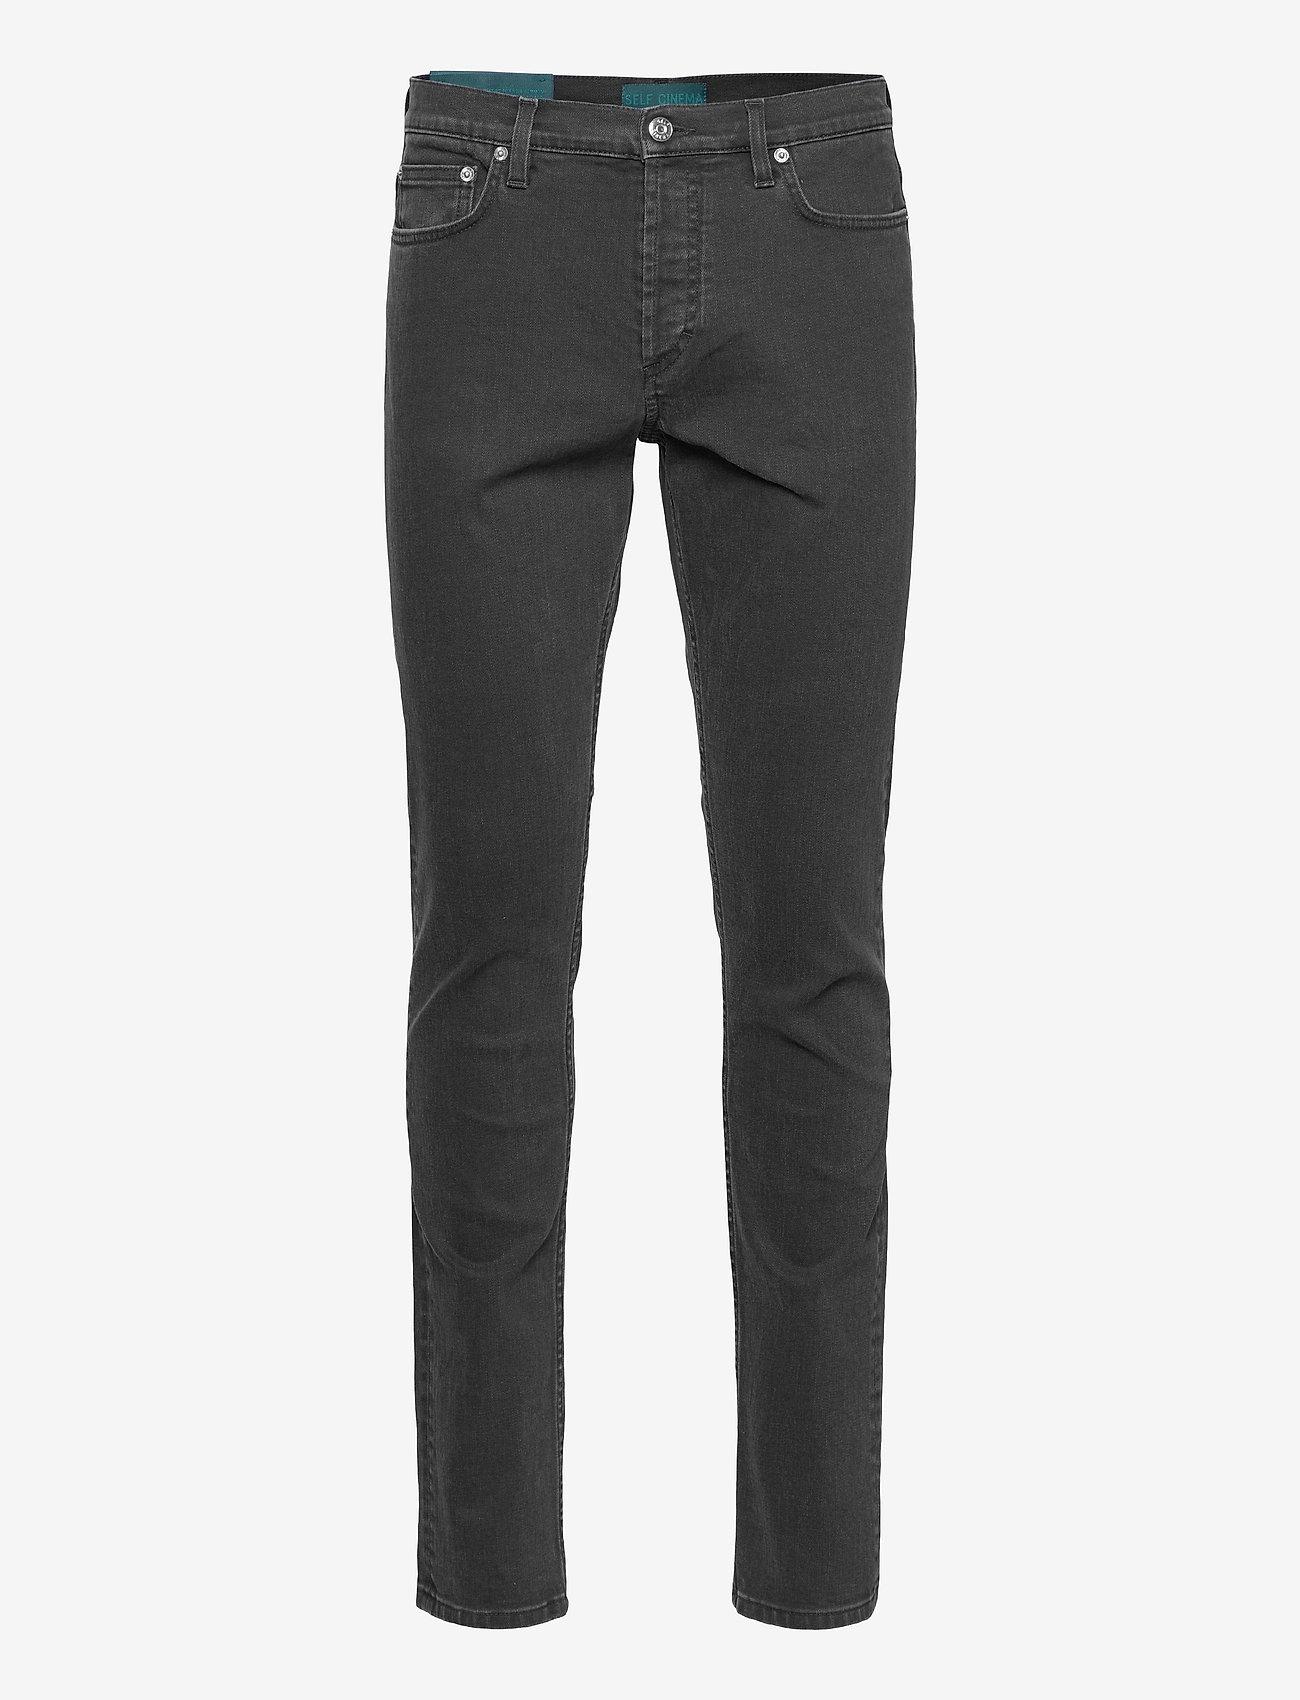 Self Cinema - Mens Slim Jean - slim jeans - washed black - 0